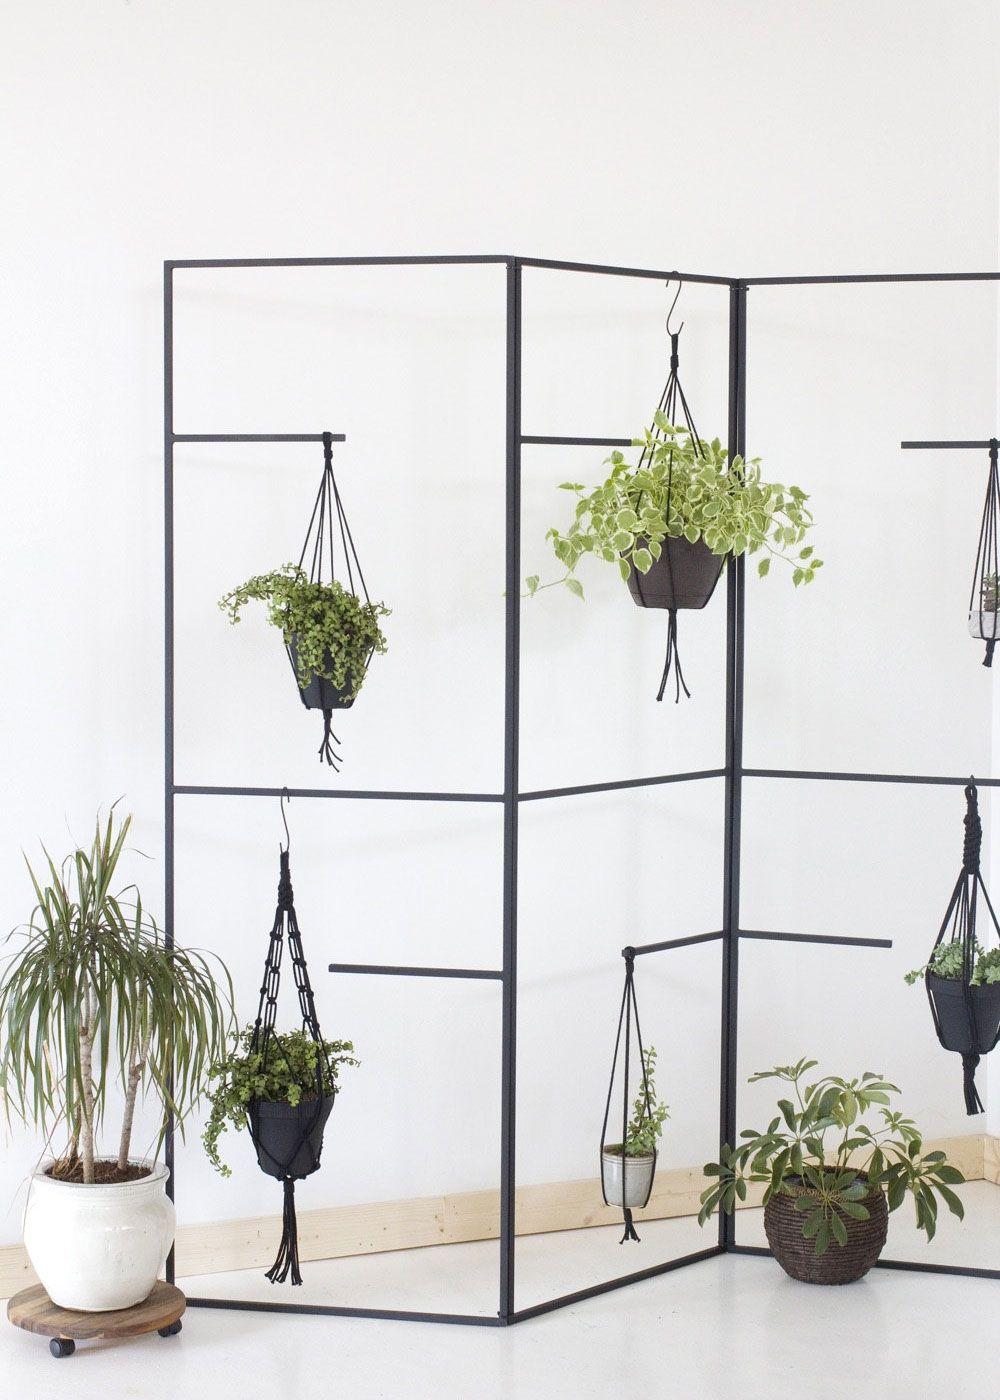 Goodies no plant hangers fashion art and diana